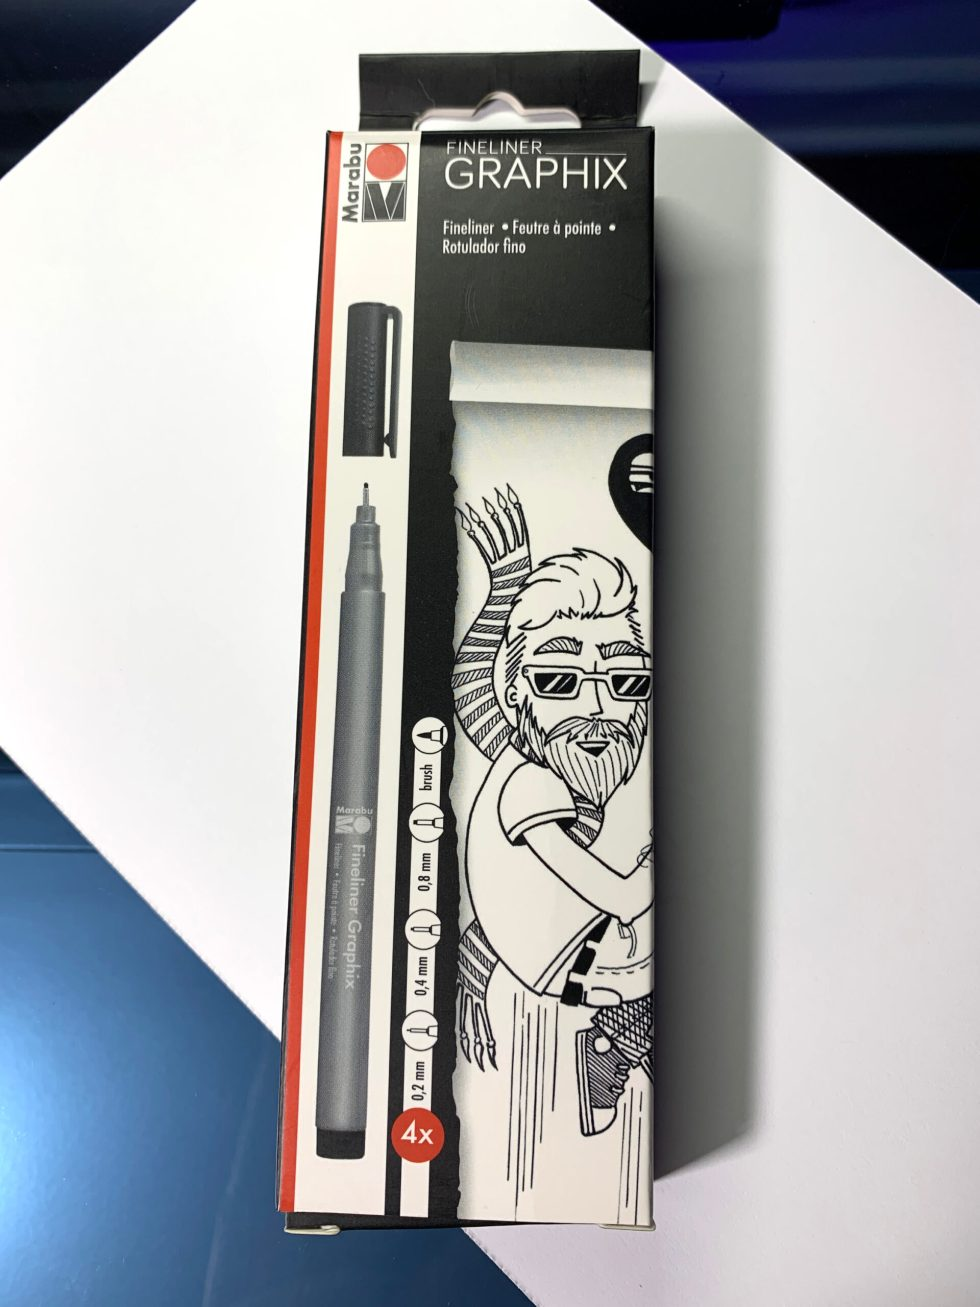 Marabu Fineliner Graphix Pens image 1